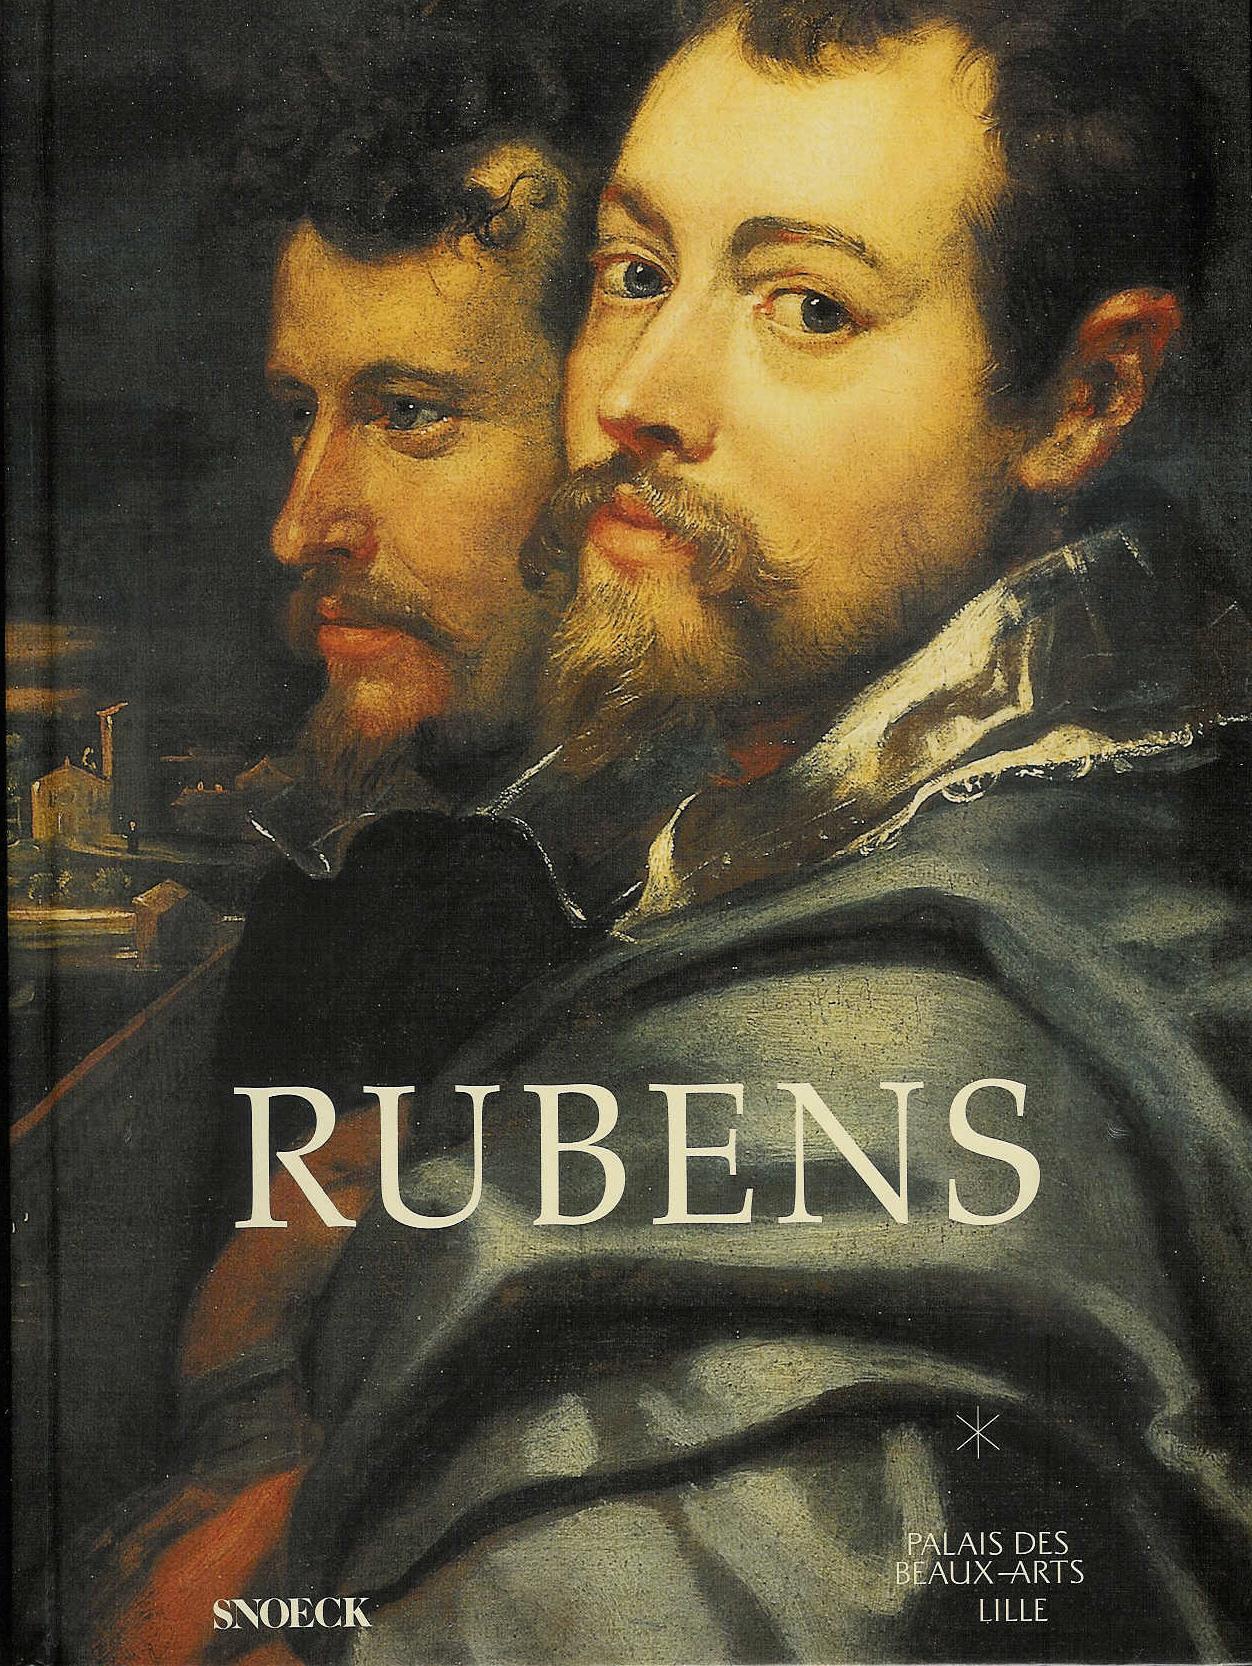 Cat. Lille 2004: Rubens